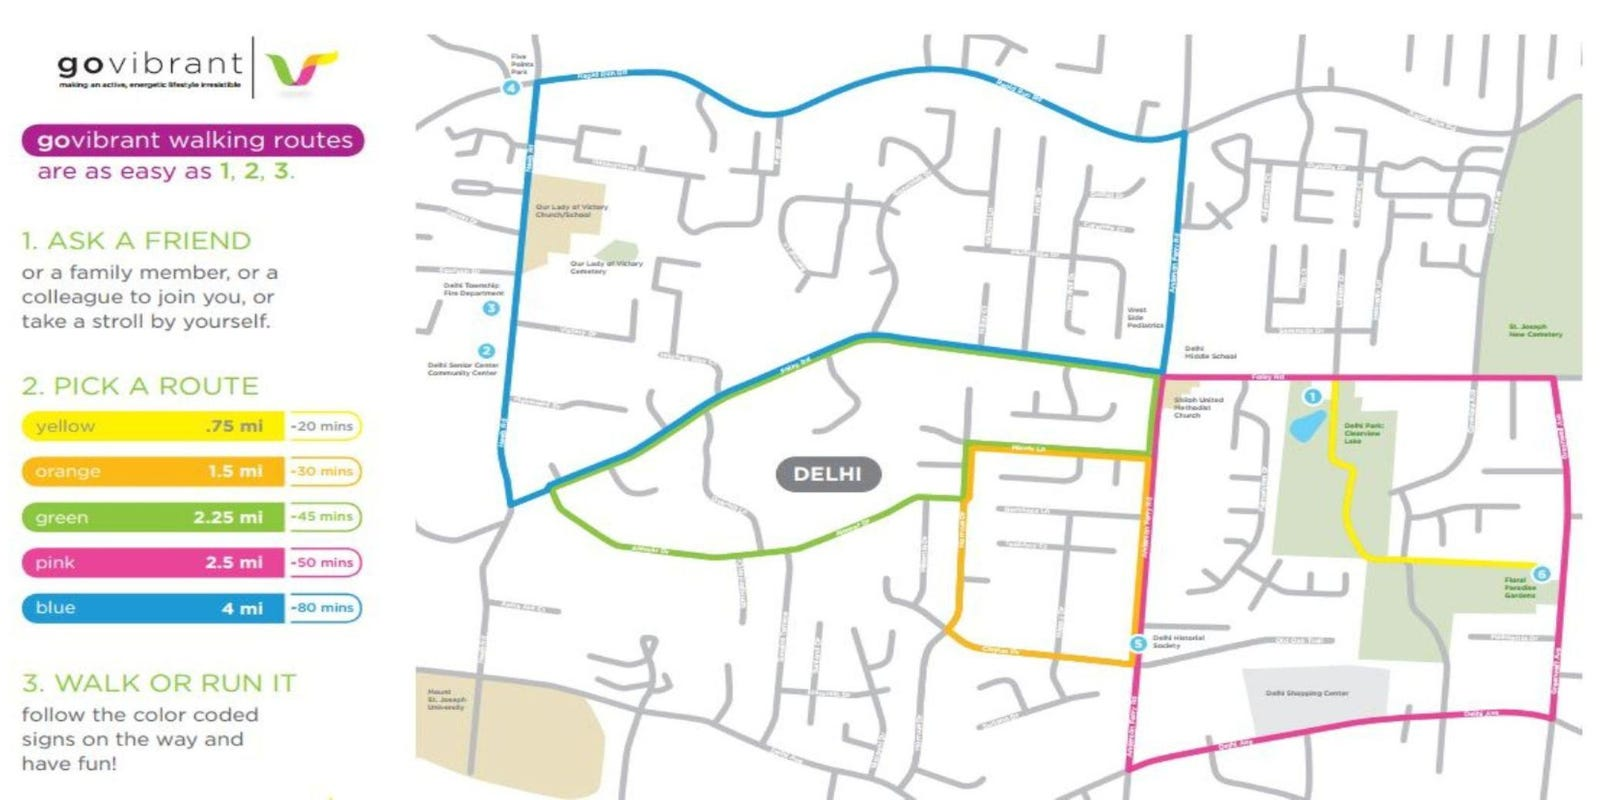 Delhi maps neighborhood walking routes on beijing on map, dhaka on map, dubai on map, isfahan on map, kuala lumpur on map, pataliputra on map, kabul on map, osaka on map, mughal empire on map, manila on map, agra on map, calcutta on map, chittagong on map, madras on map, amritsar on map, lahore on map, karachi on map, sind on map, kolkata on map, goa on map,